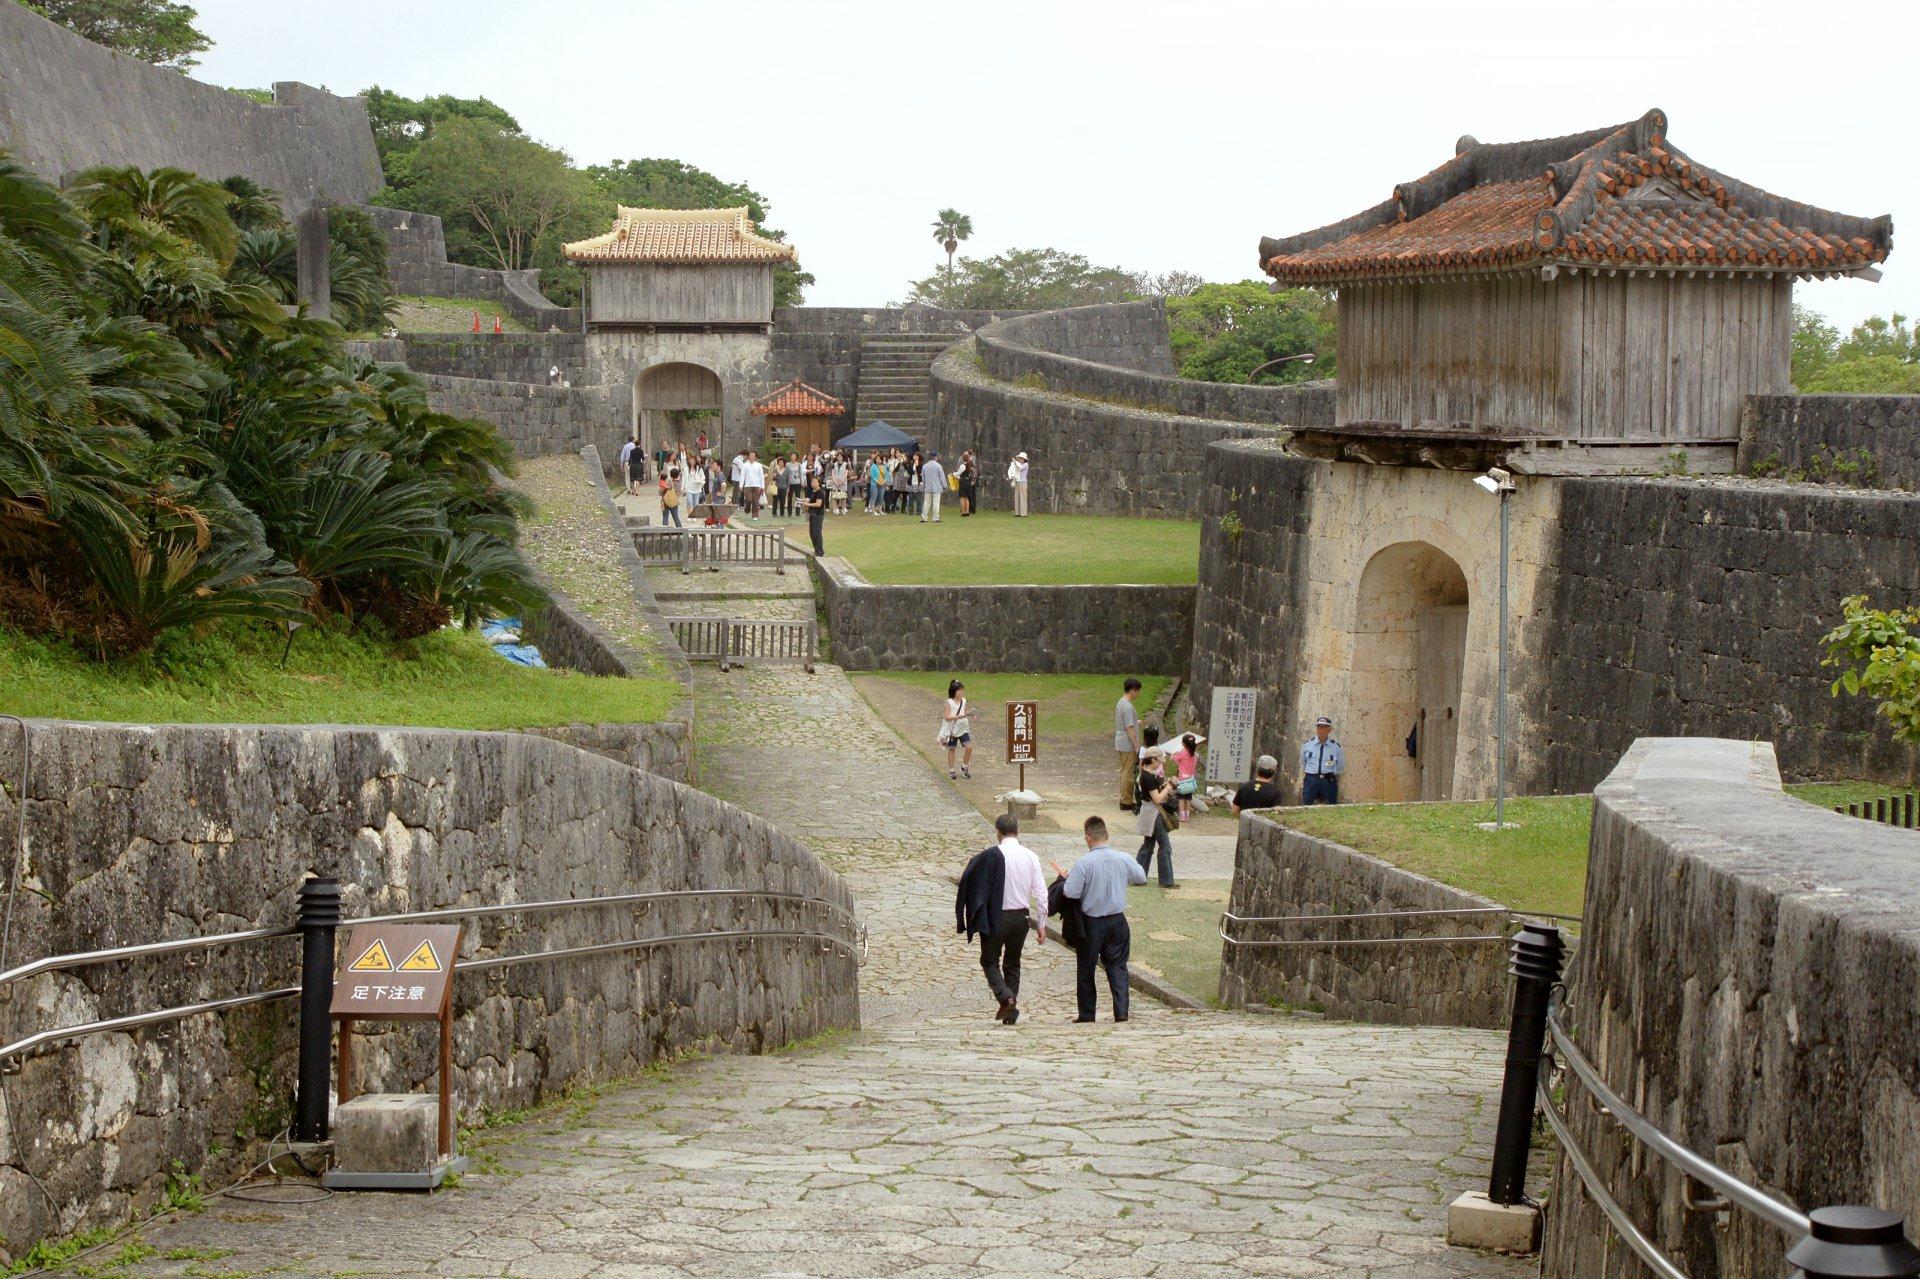 Naha_Shuri_Castle28s5s3200.jpg